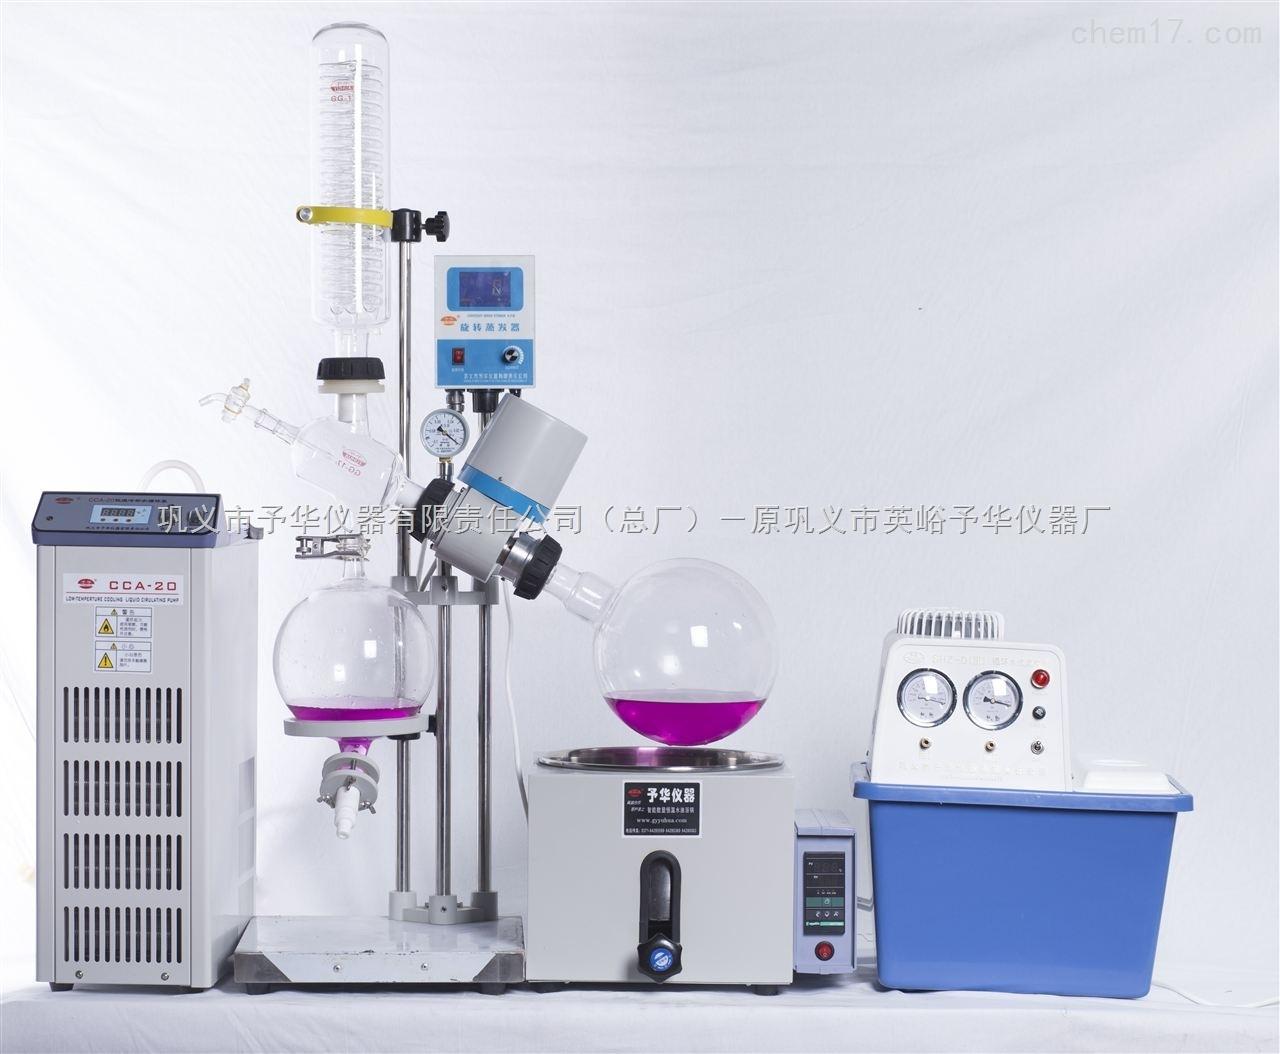 YRE-501旋转蒸发仪(5升旋转瓶/3升接收瓶/90转每分)巩义予华